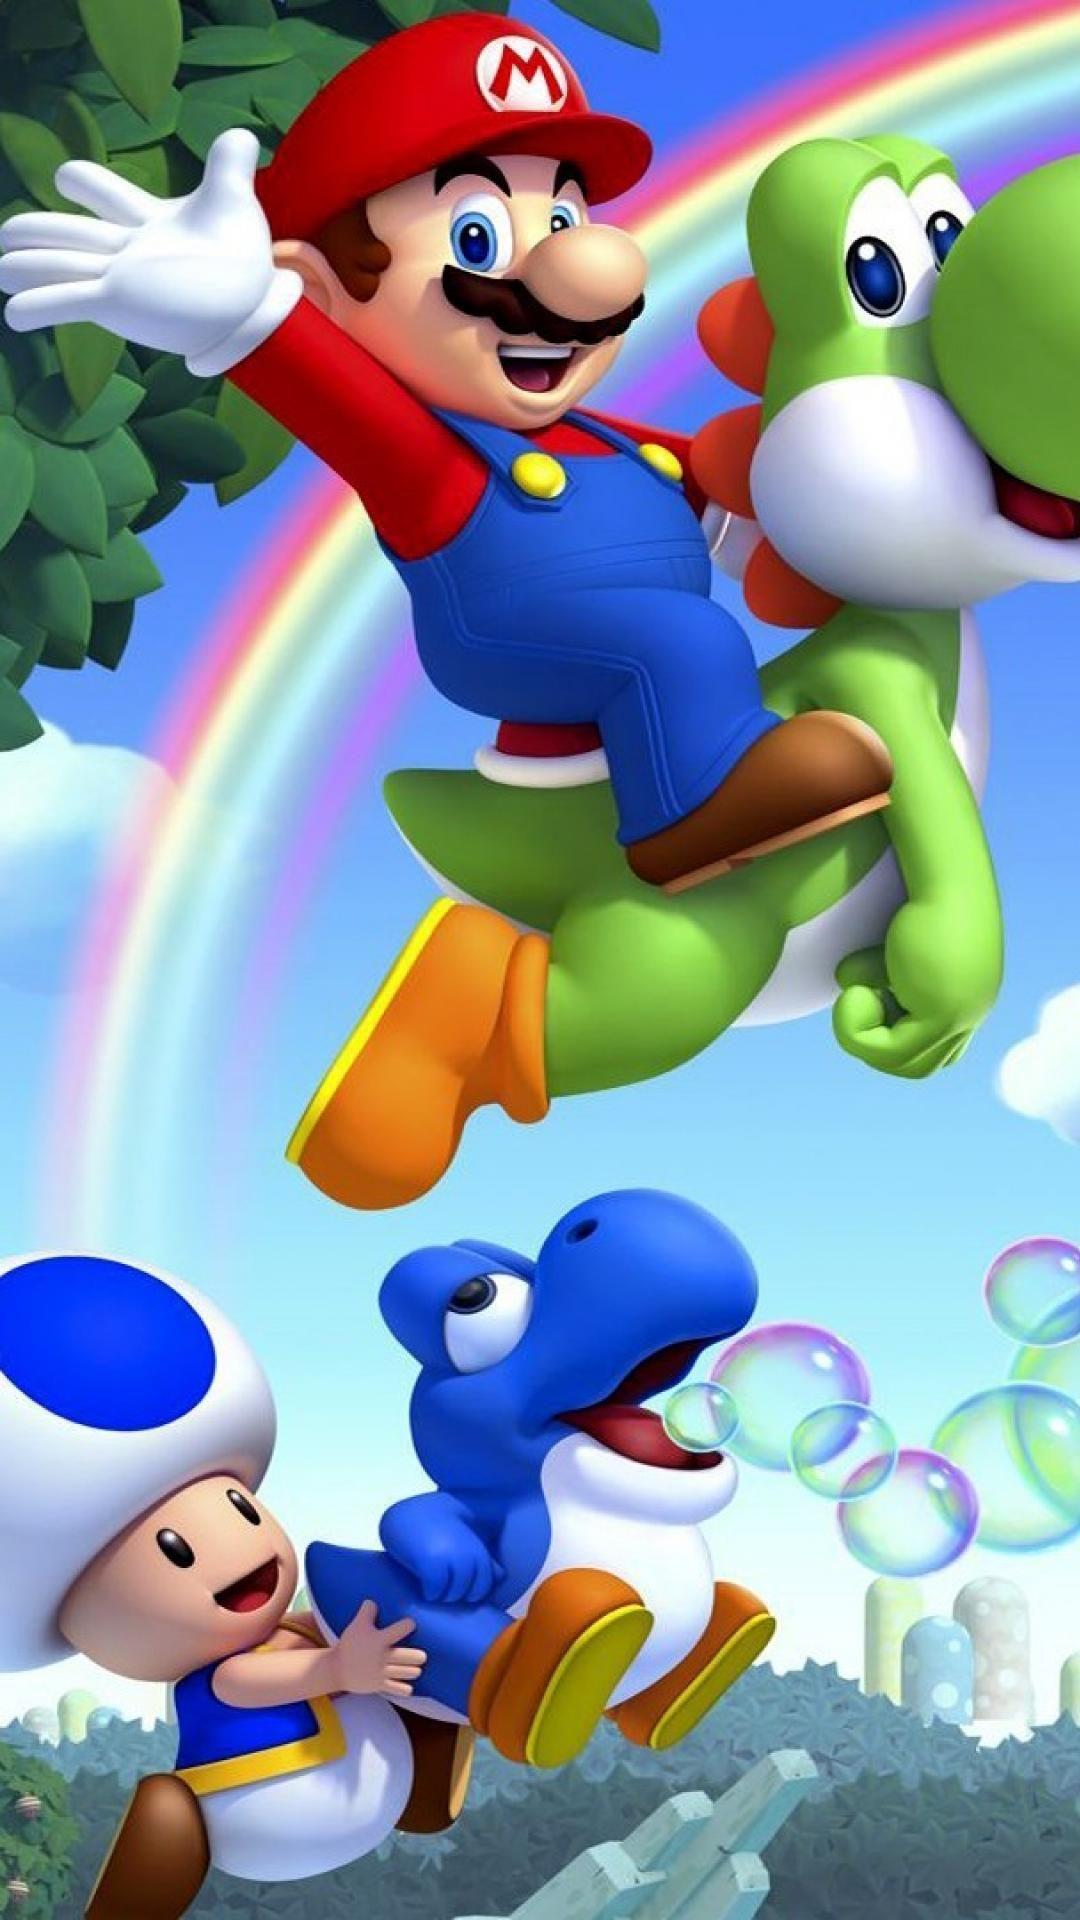 Lol guys look at toads blue yoshi Mario, Super mario run